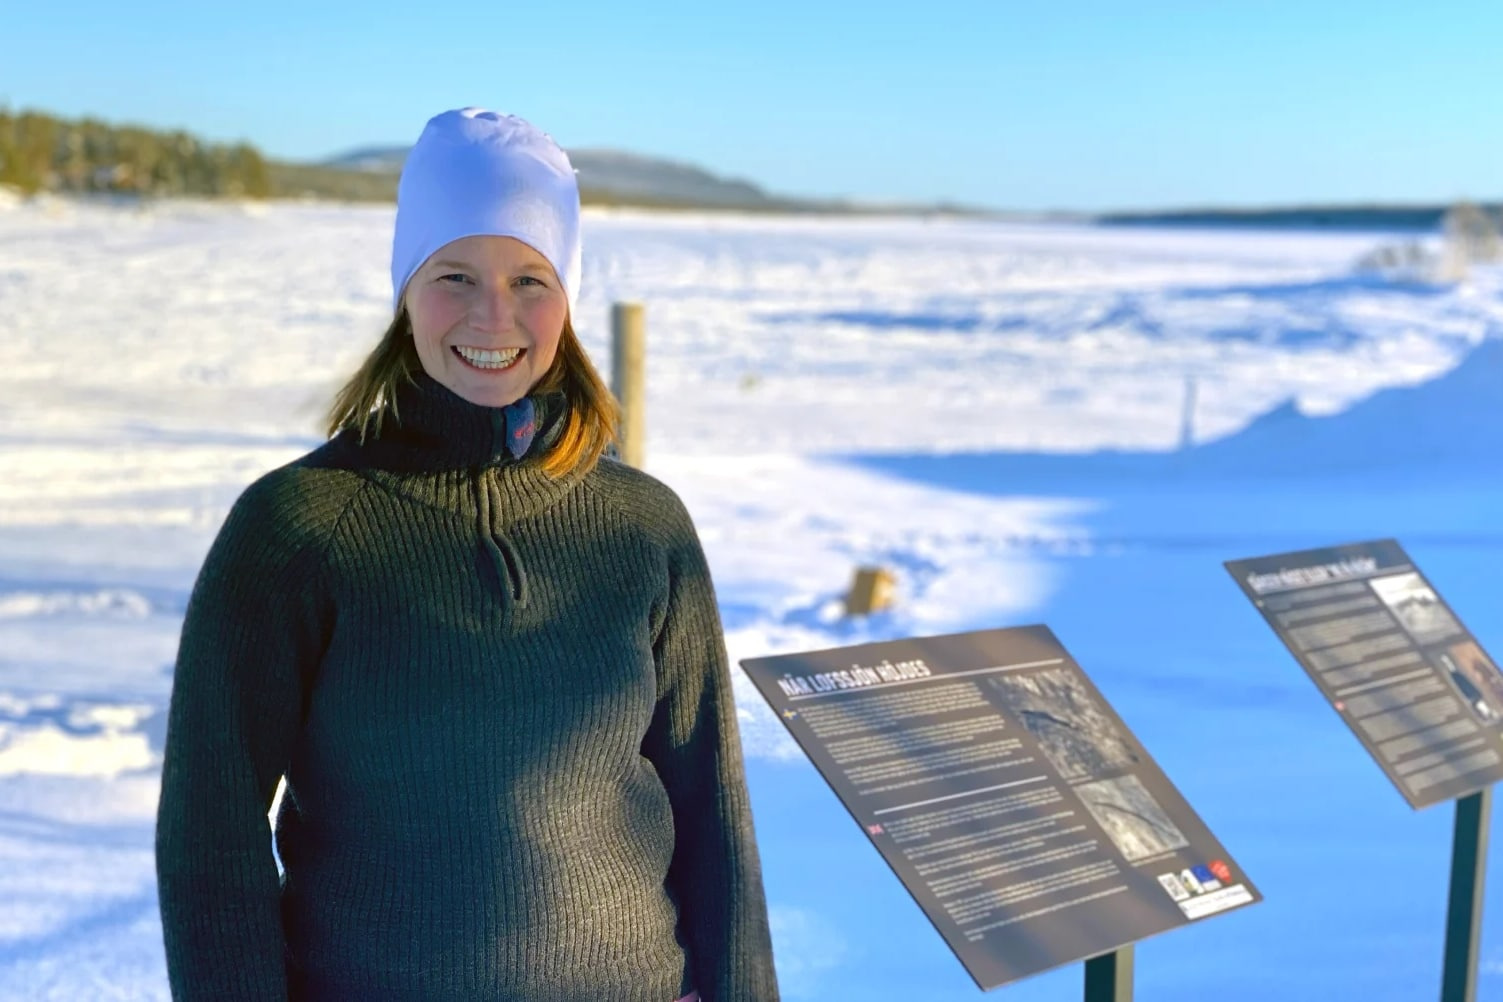 Ny kulturled lyfter historien i Lofsdalen